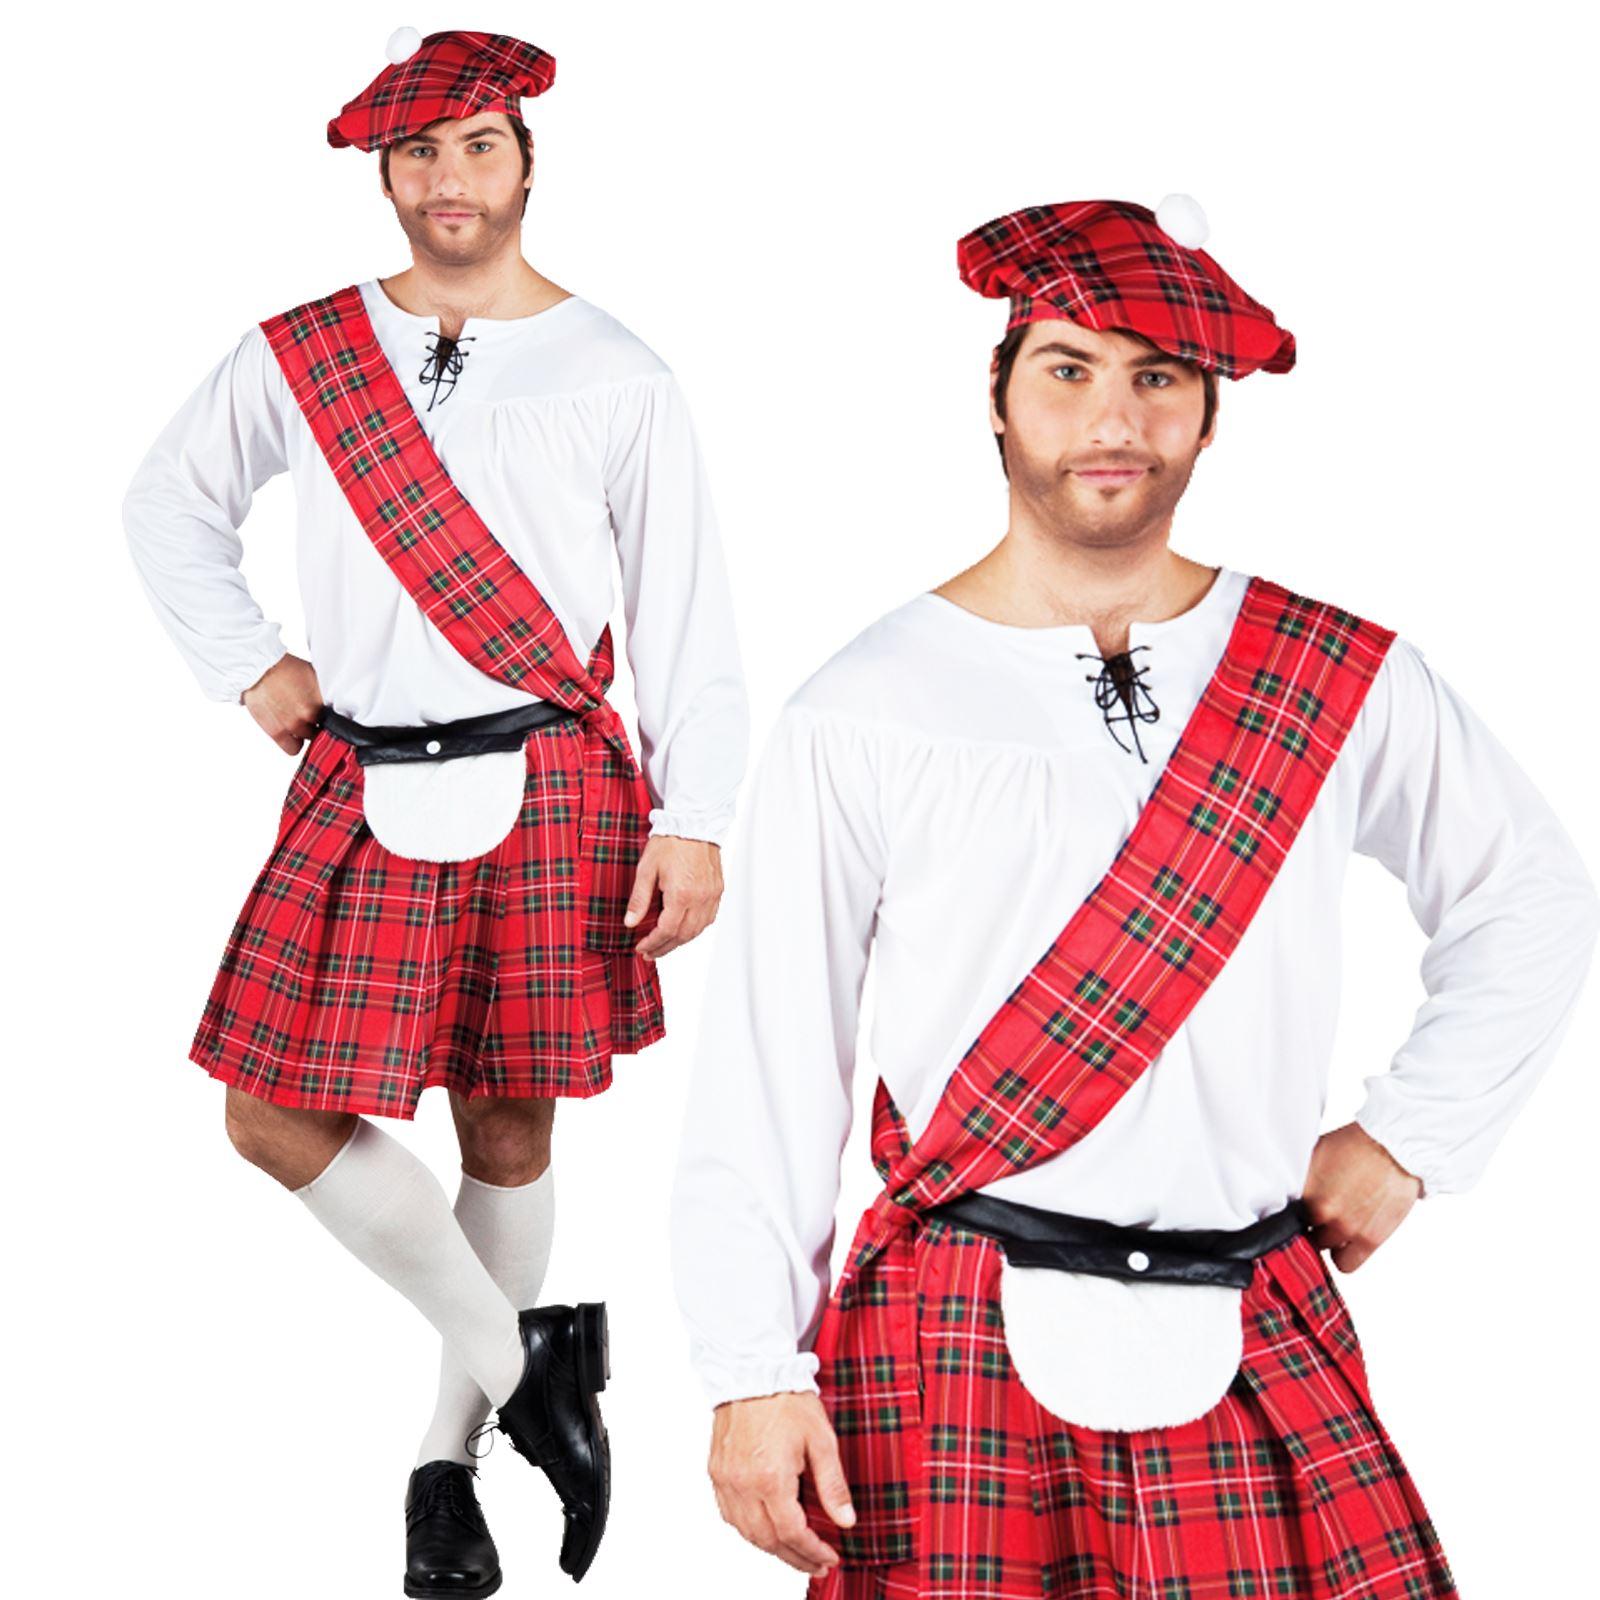 new scottish scotsman burns tartan kilt sash shirt